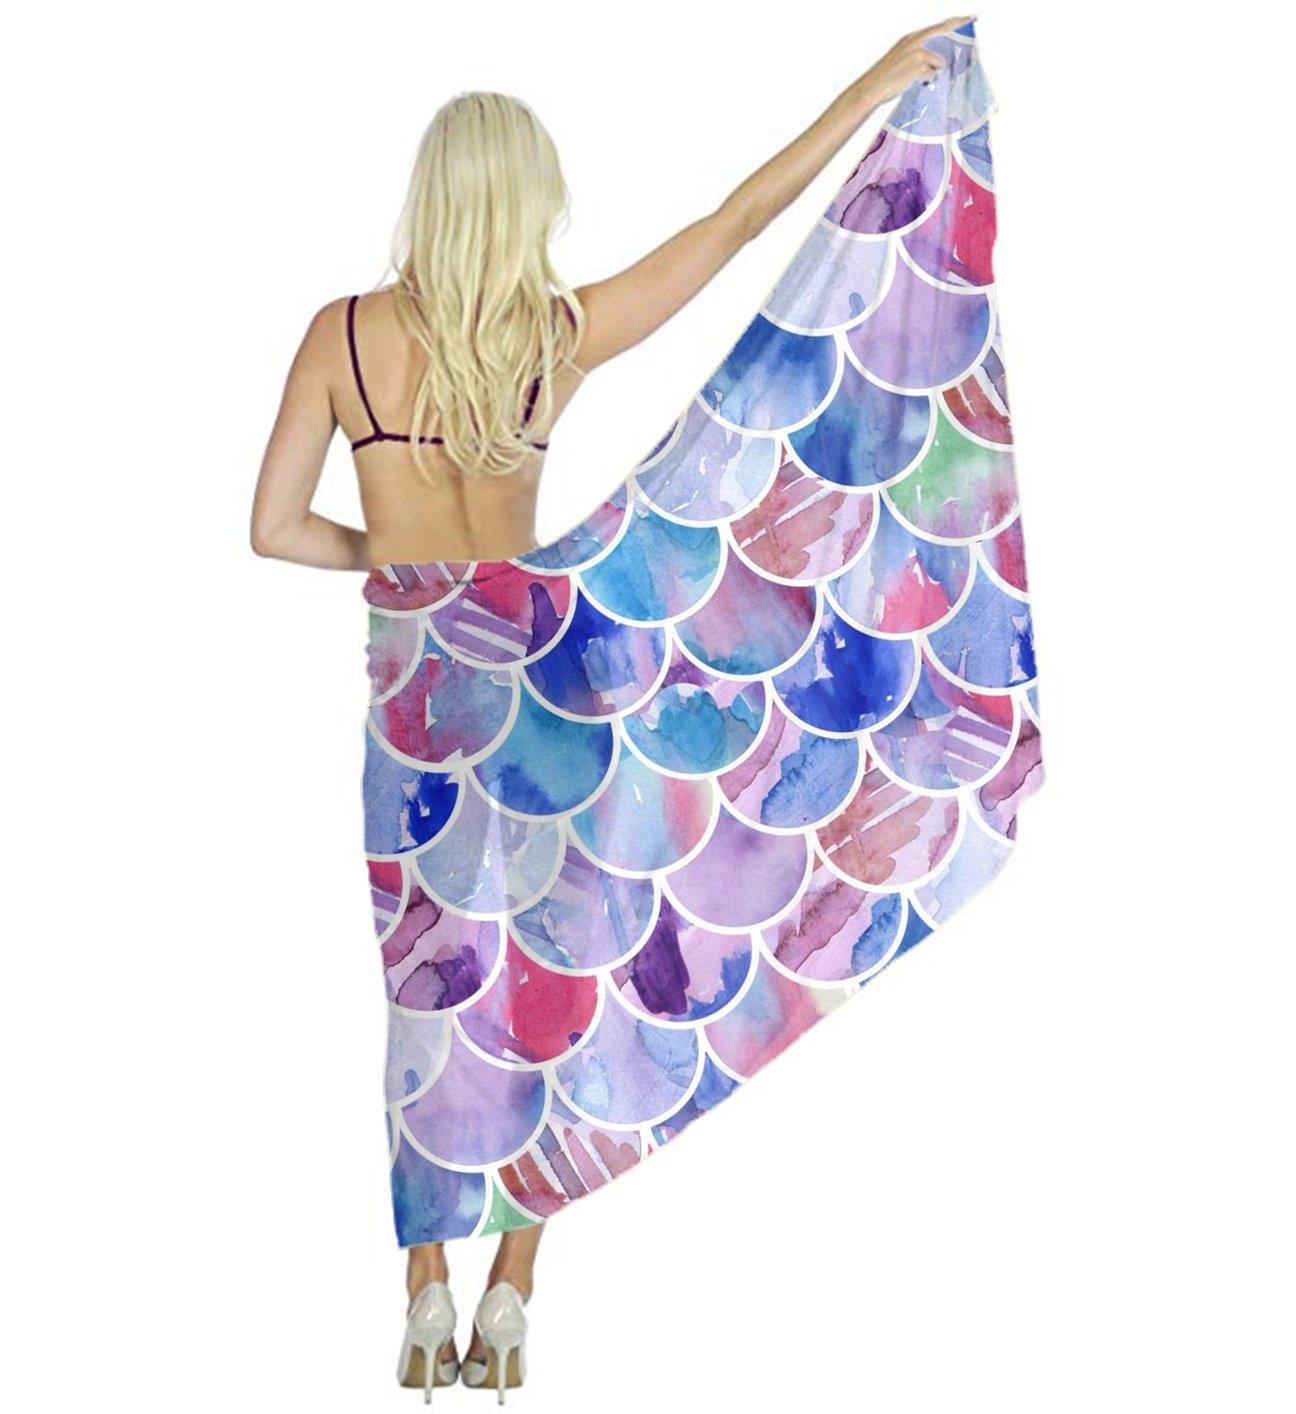 Silk Like Scarf Women's Fashion Large Satin Shawls Colorful Mermaid Fish Scales Headscarf